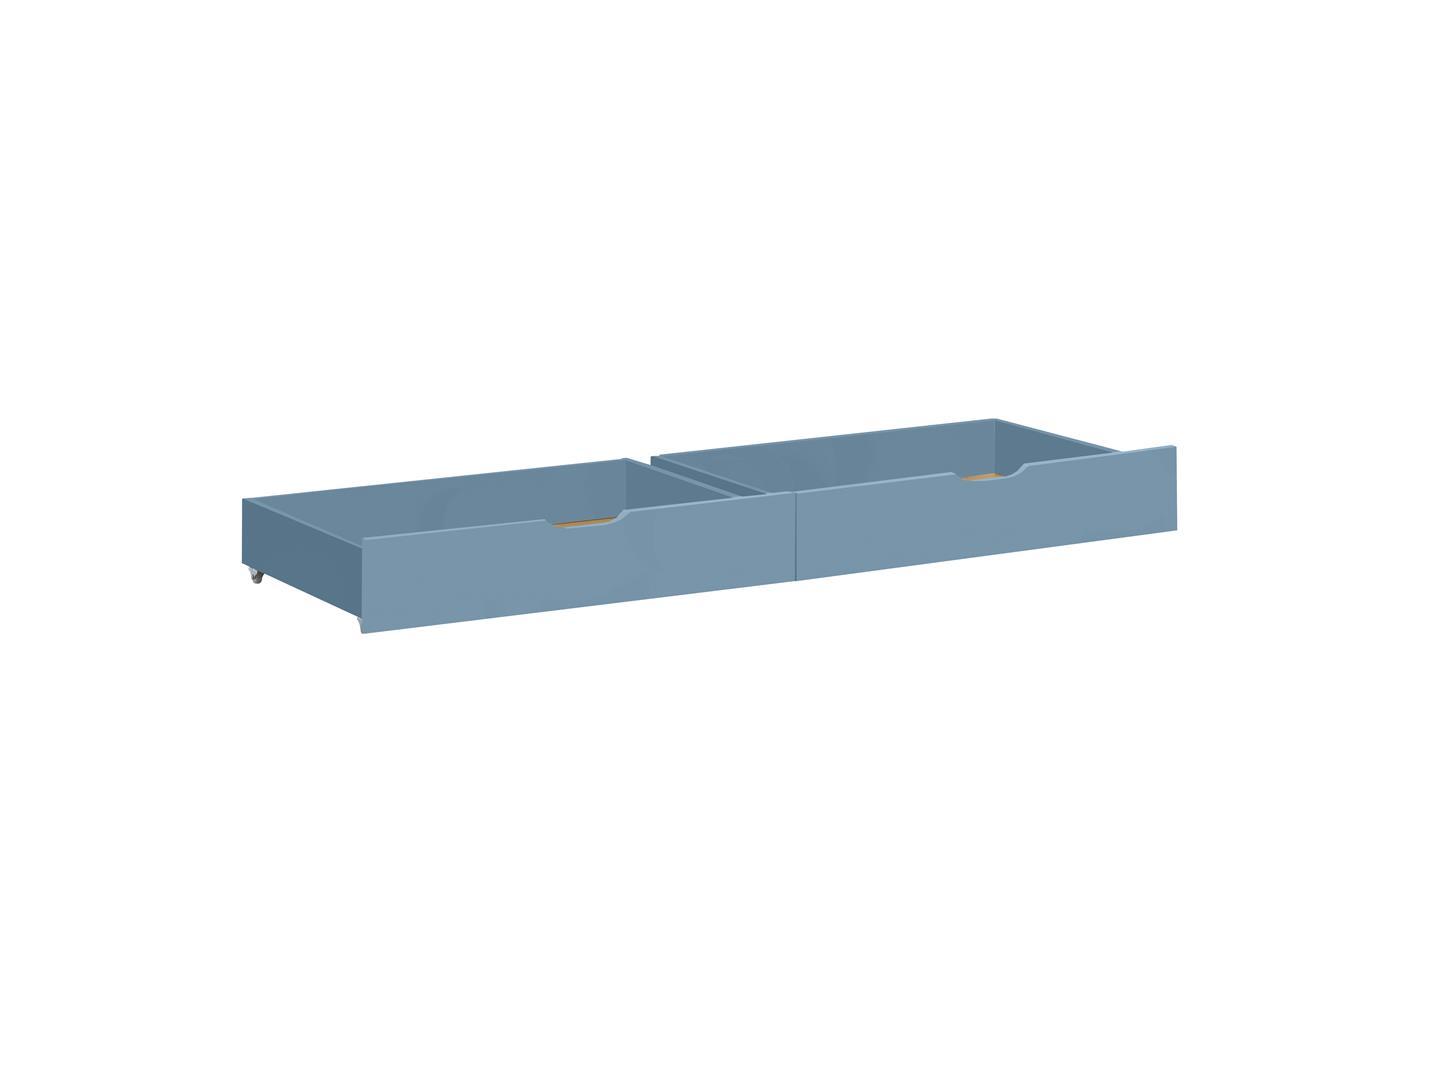 Hoppekids - IDA-MARIE Bed Drawer on Wheel 2 pcs - Dusted Blue